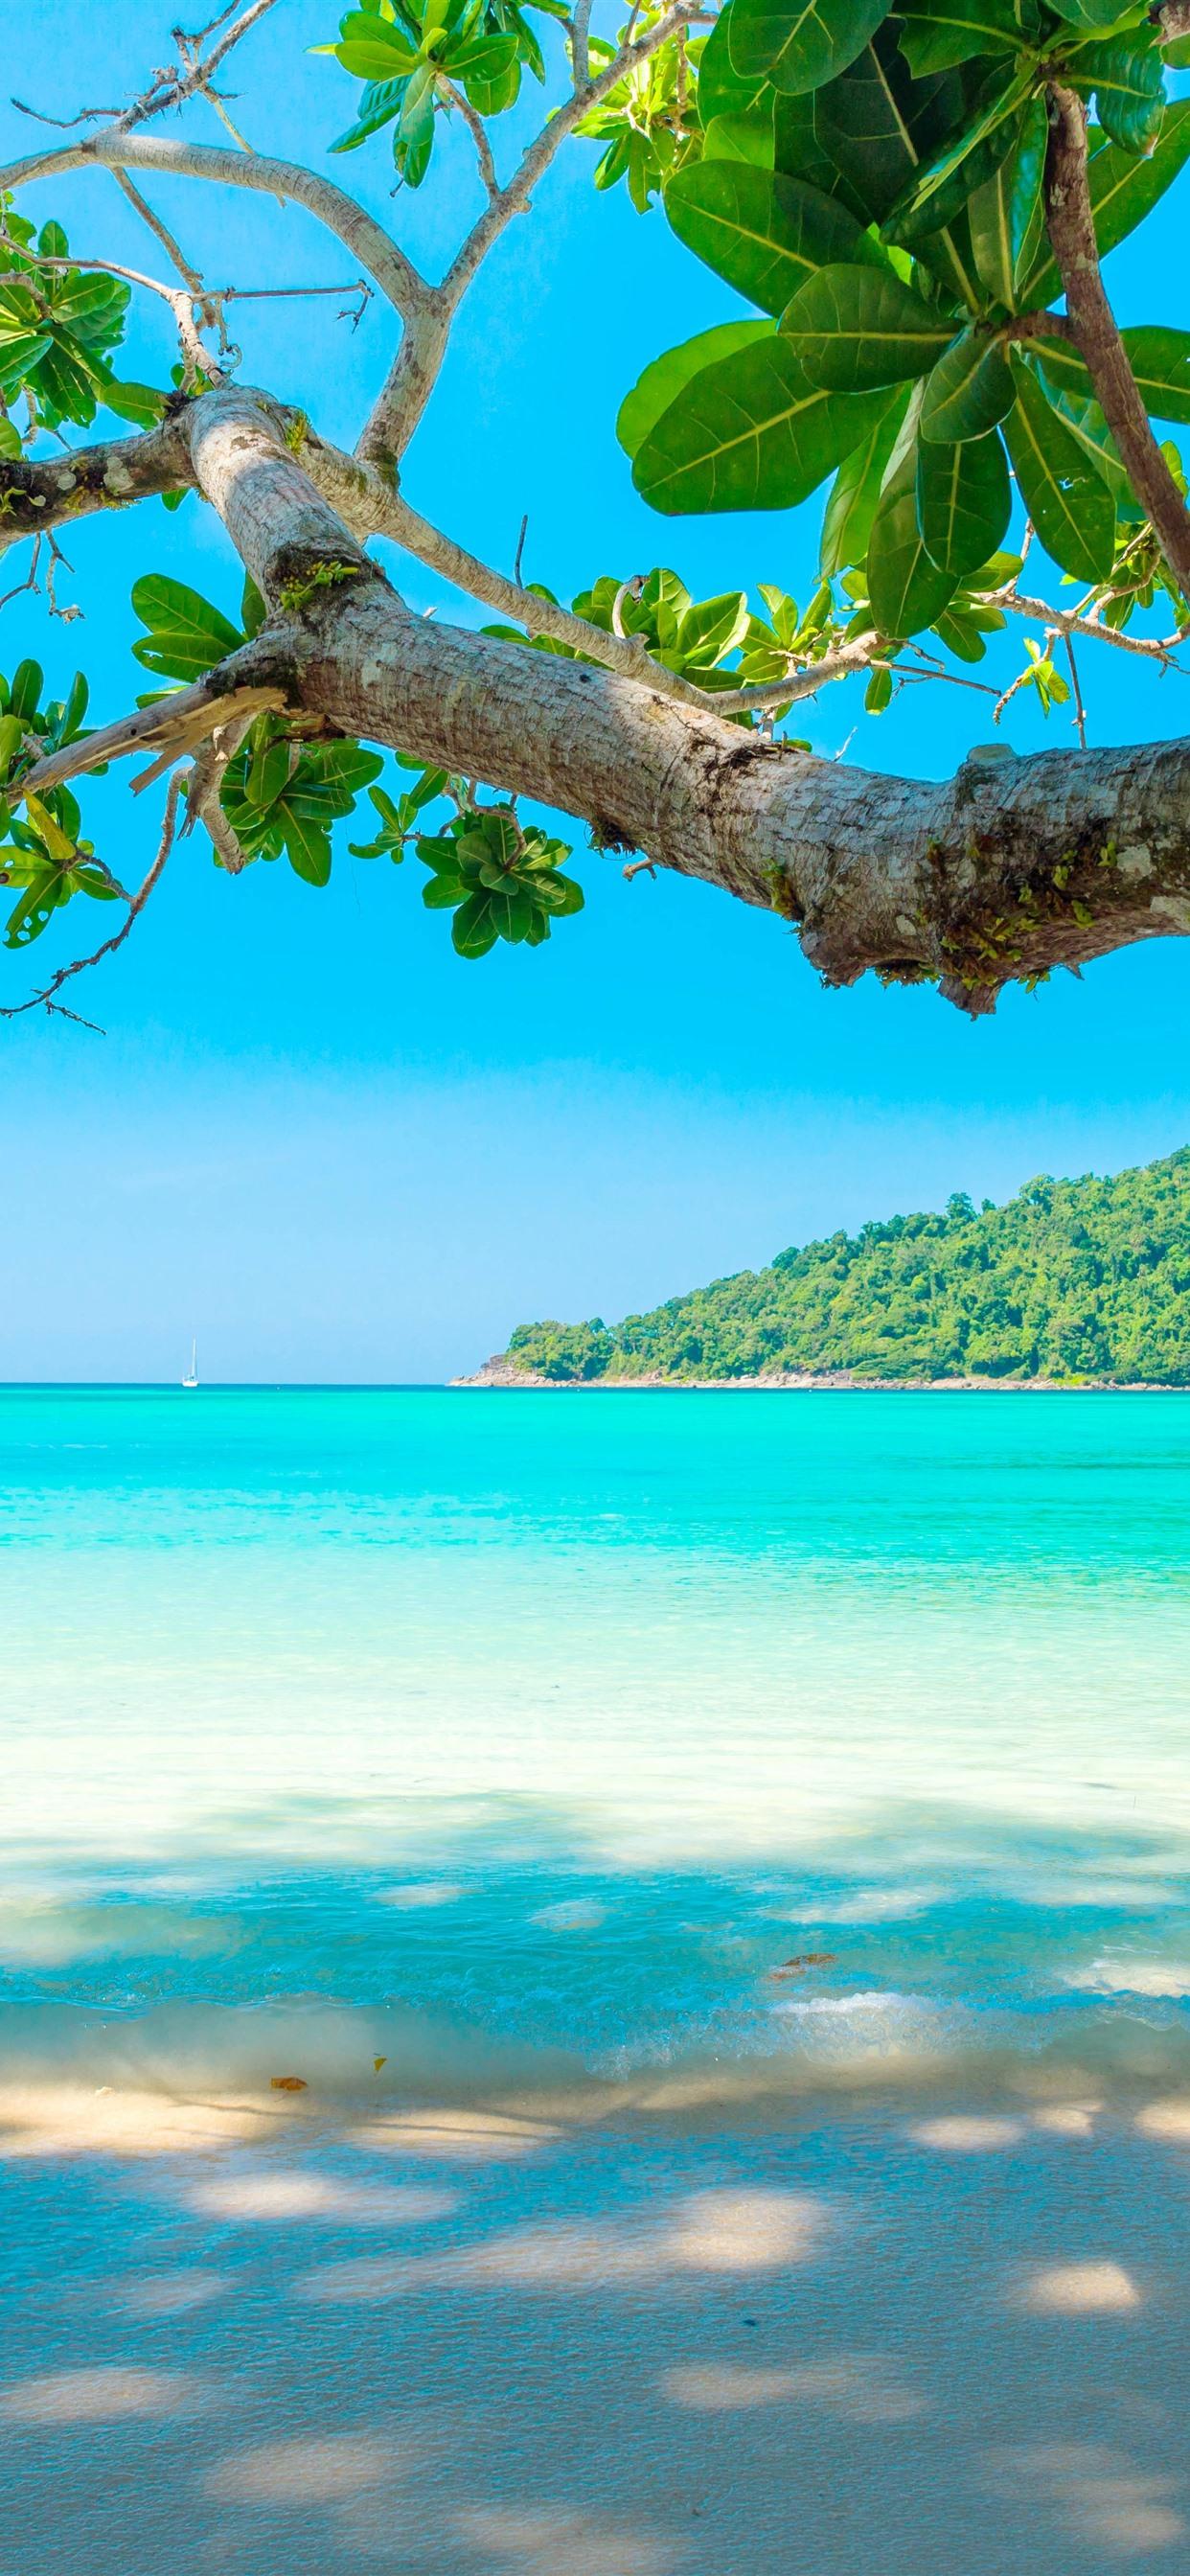 Beautiful Sea Beach Tree Tropical 1242x2688 Iphone Xs Max